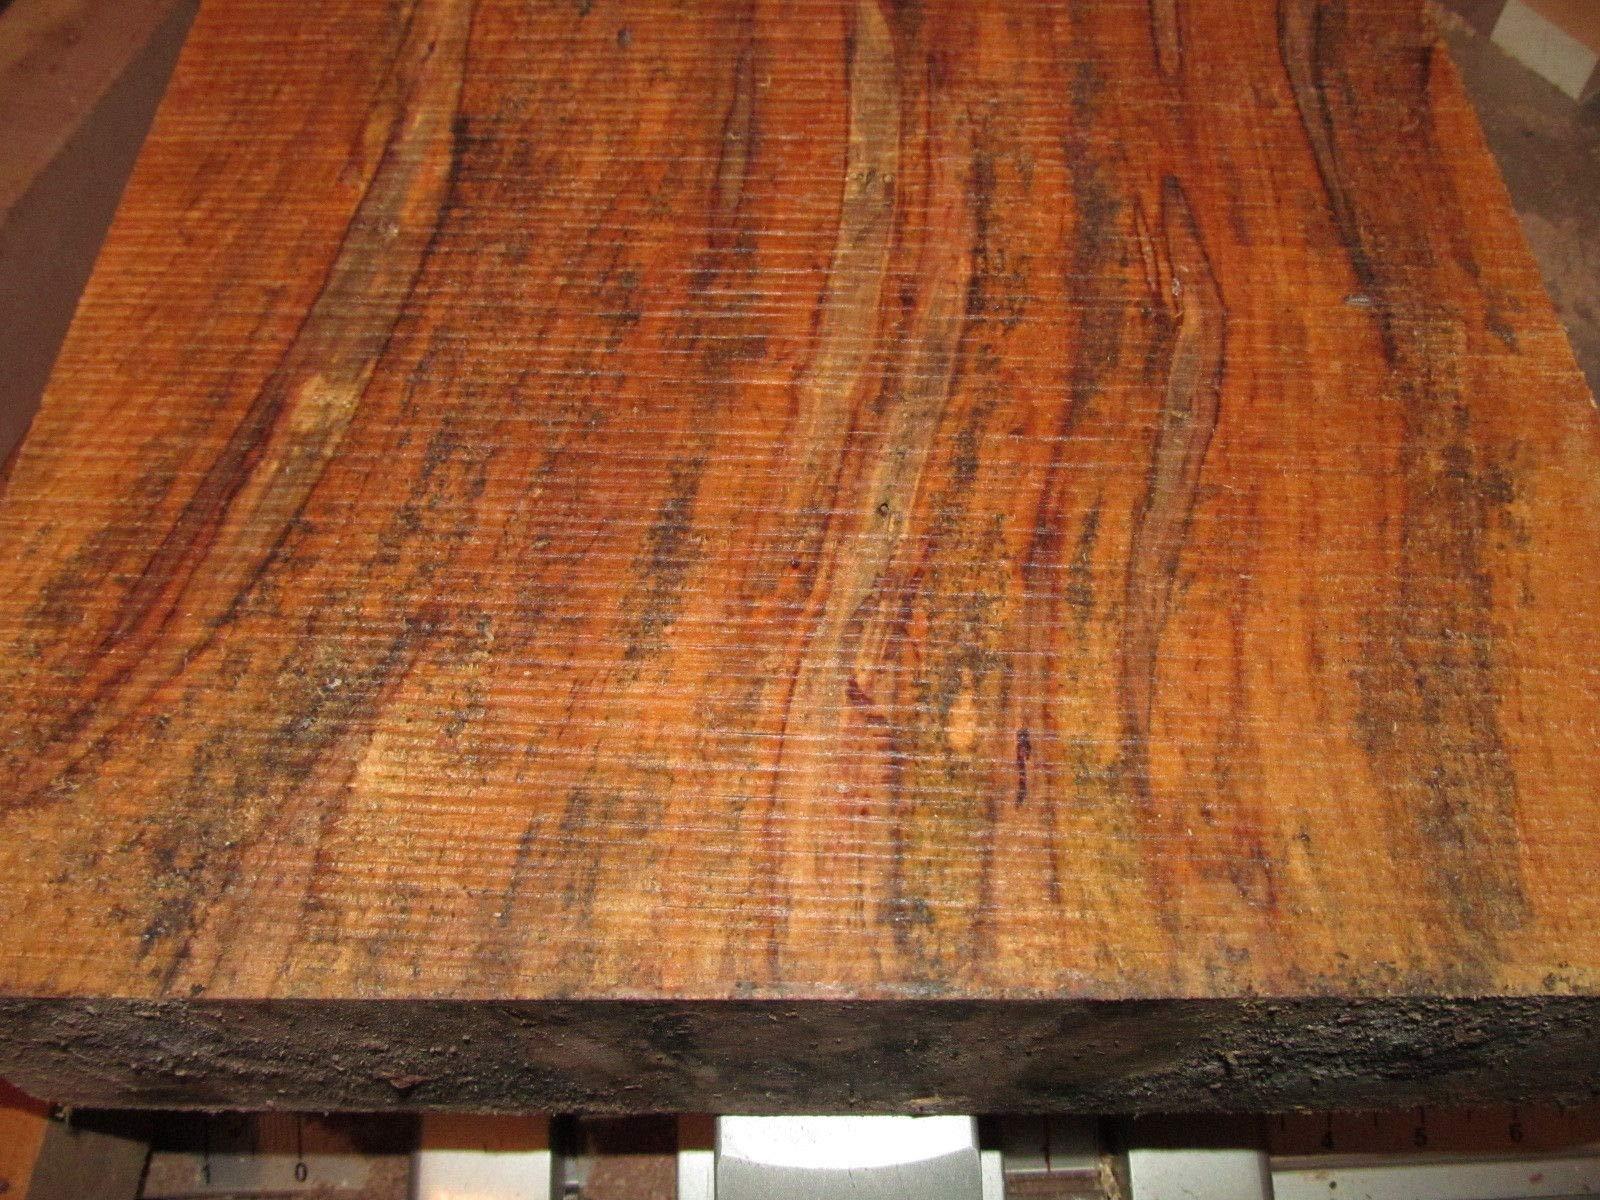 1 Piece of Large Thick Ambrosia Maple Bowl Blank Turning Block Lumber 12 X 12 X 4''